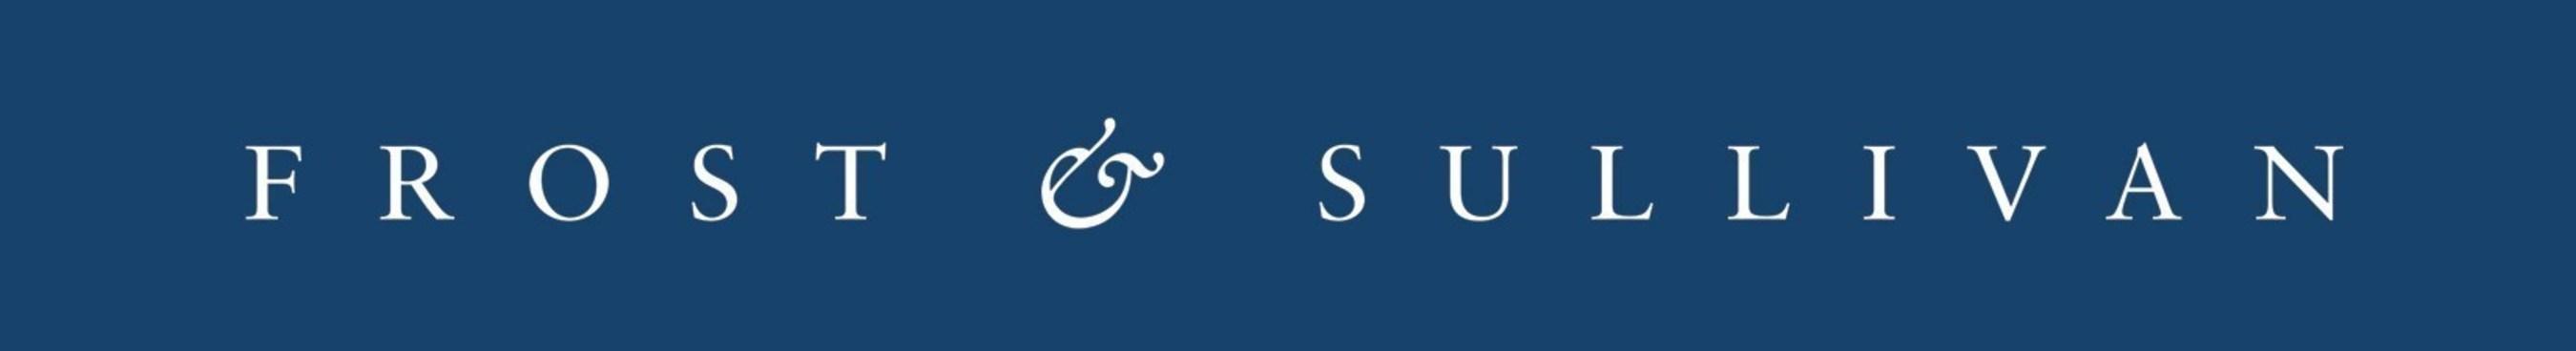 Frost & Sullivan - Measurement & Instrumentation Practice